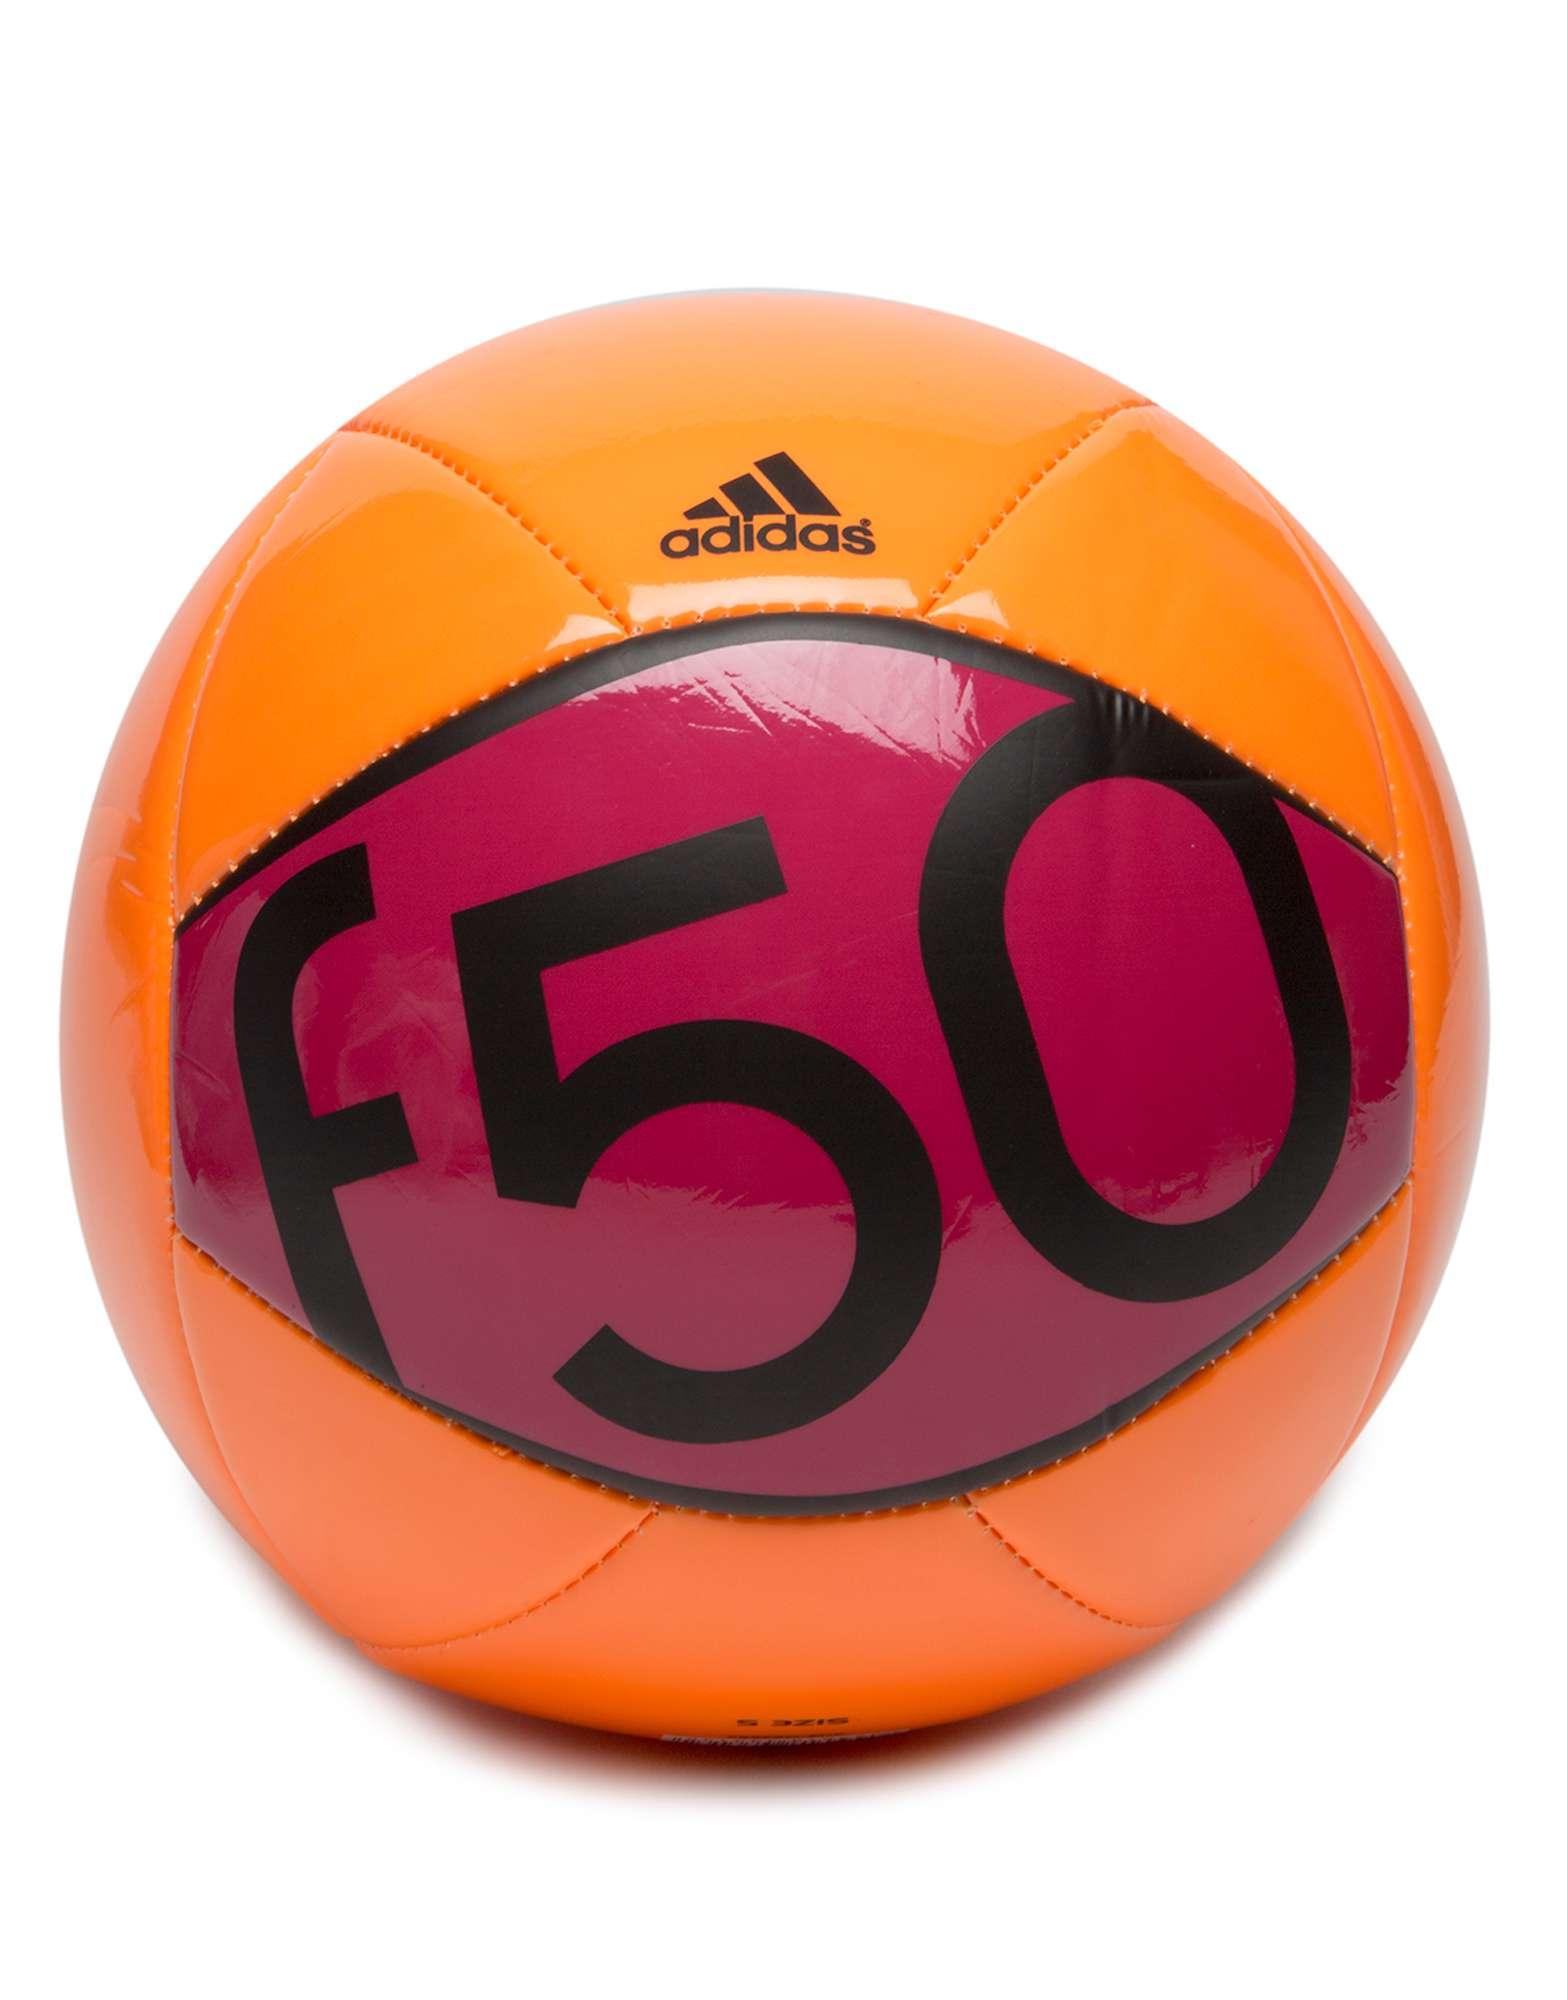 adidas F50 X-ITE II Football